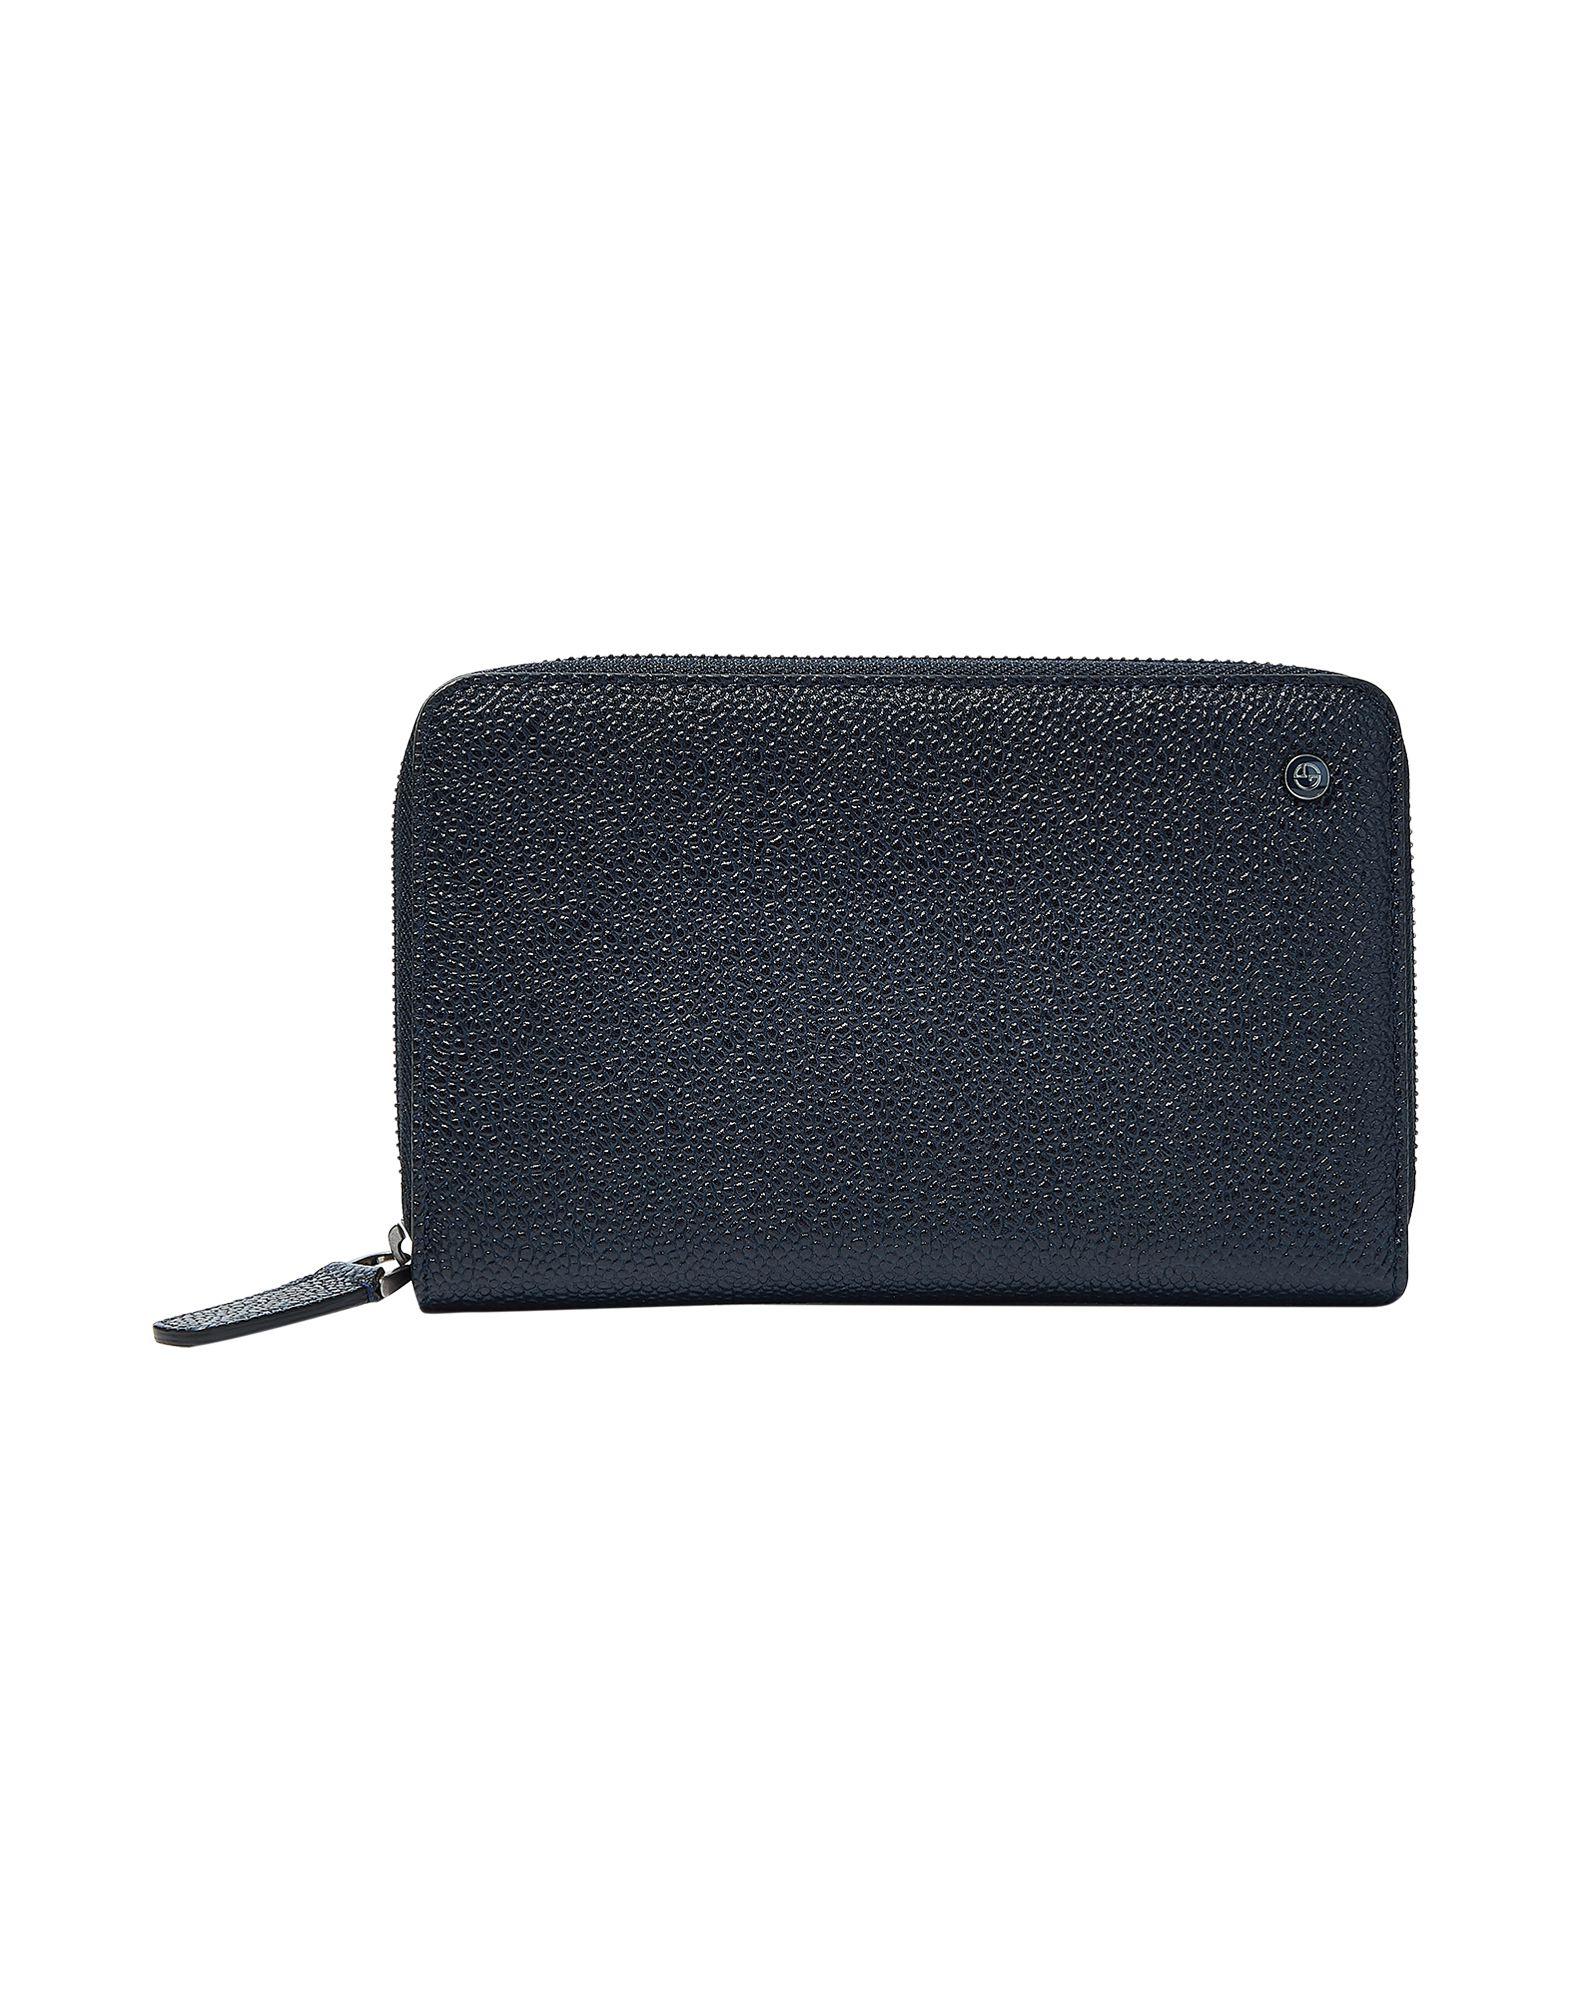 GIORGIO ARMANI Covers & Cases. solid color, contains non-textile parts of animal origin, logo. 100% Calfskin